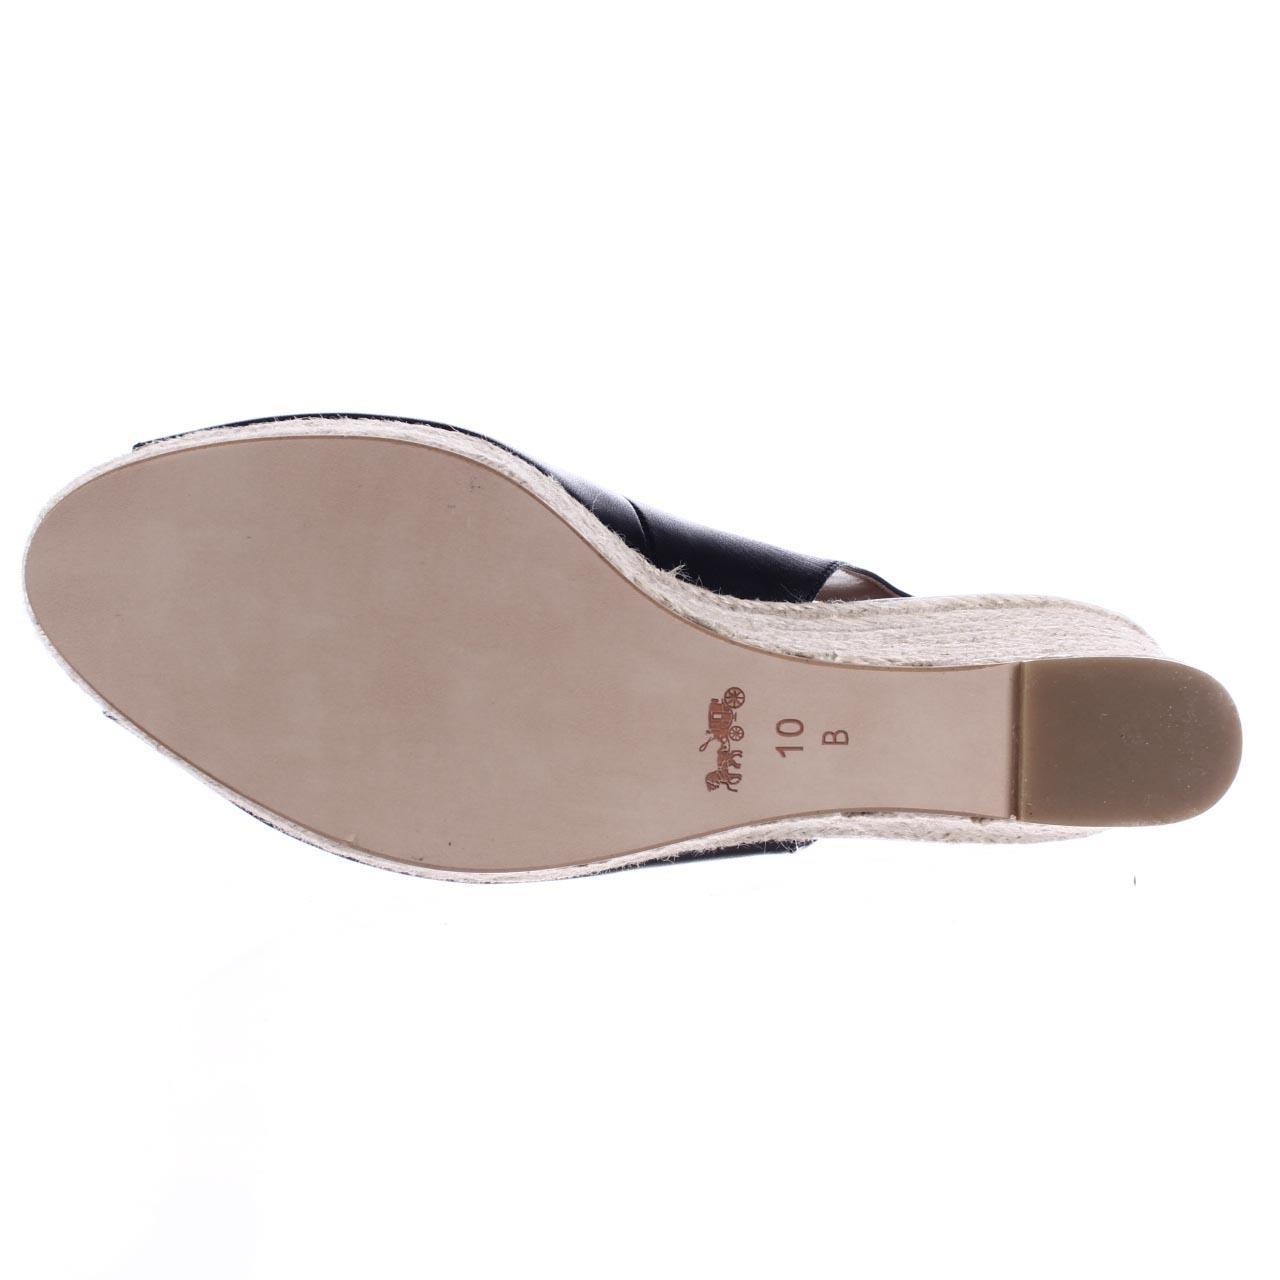 Coach Ferry Peep Toe Slingback Espadrille Wedge Sandals In